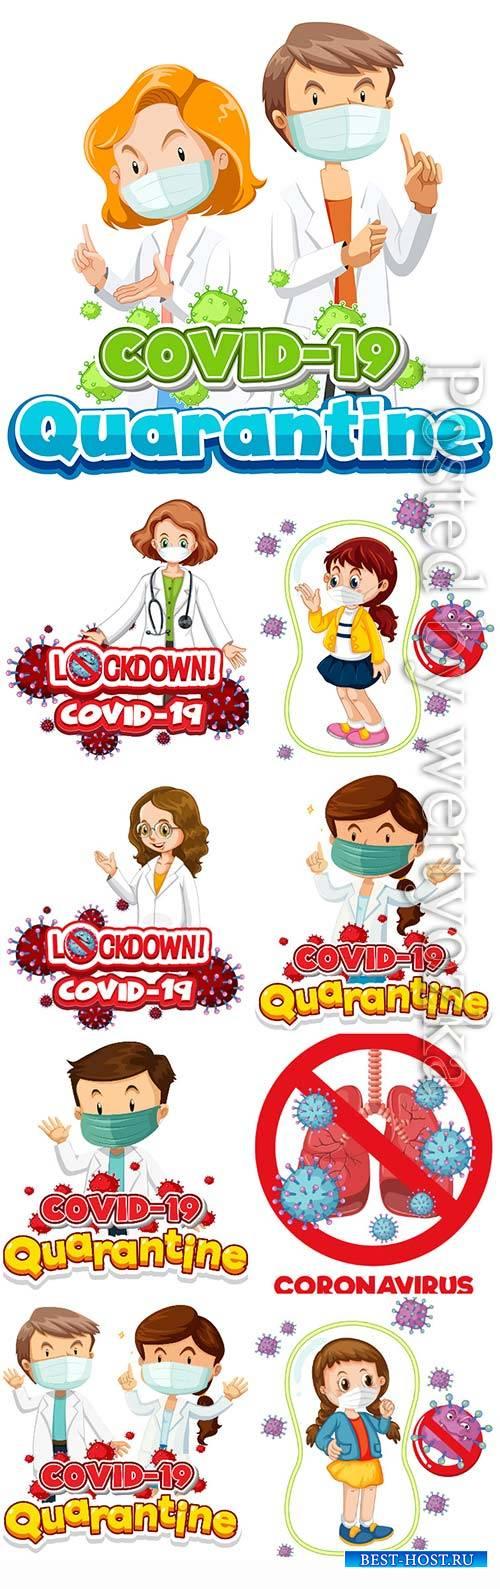 Coronavirus, medicine and people concept vector # 7